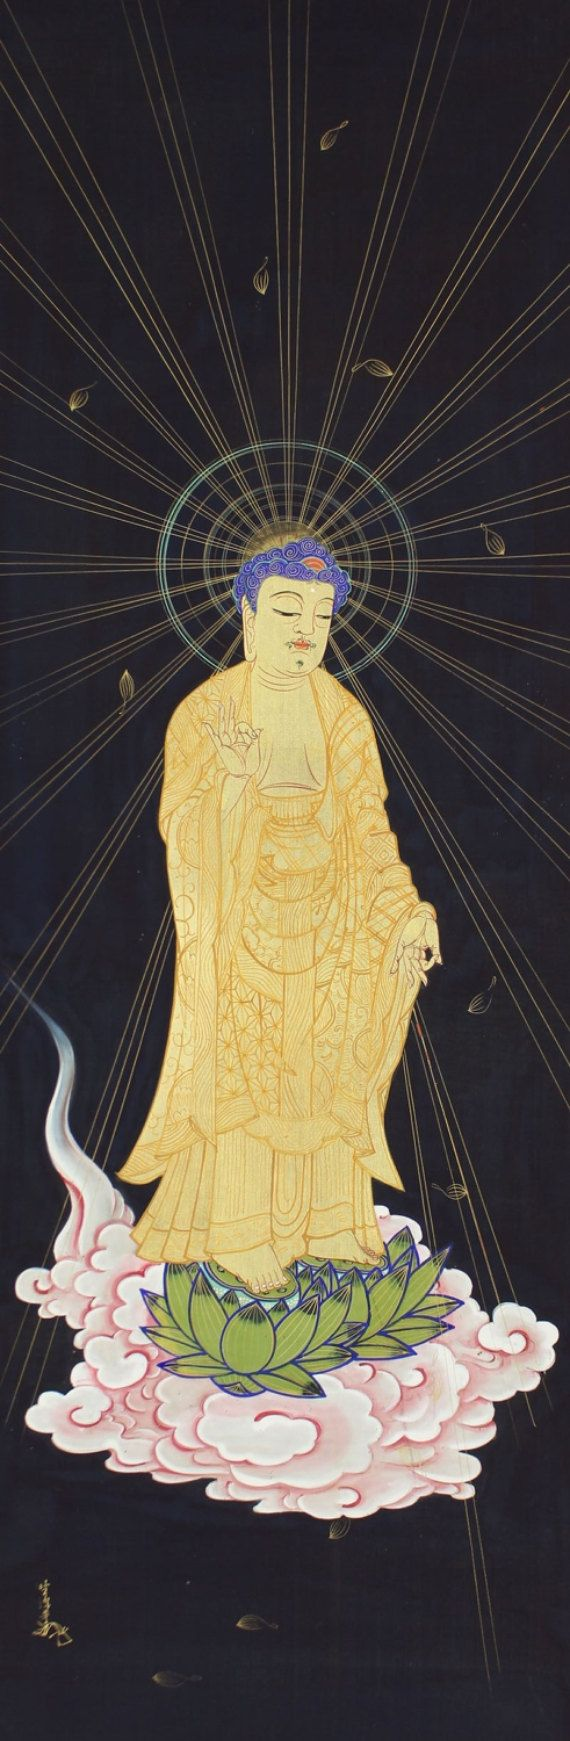 16 best Buddhist Art images on Pinterest | Buddha art, Buddhist art ...